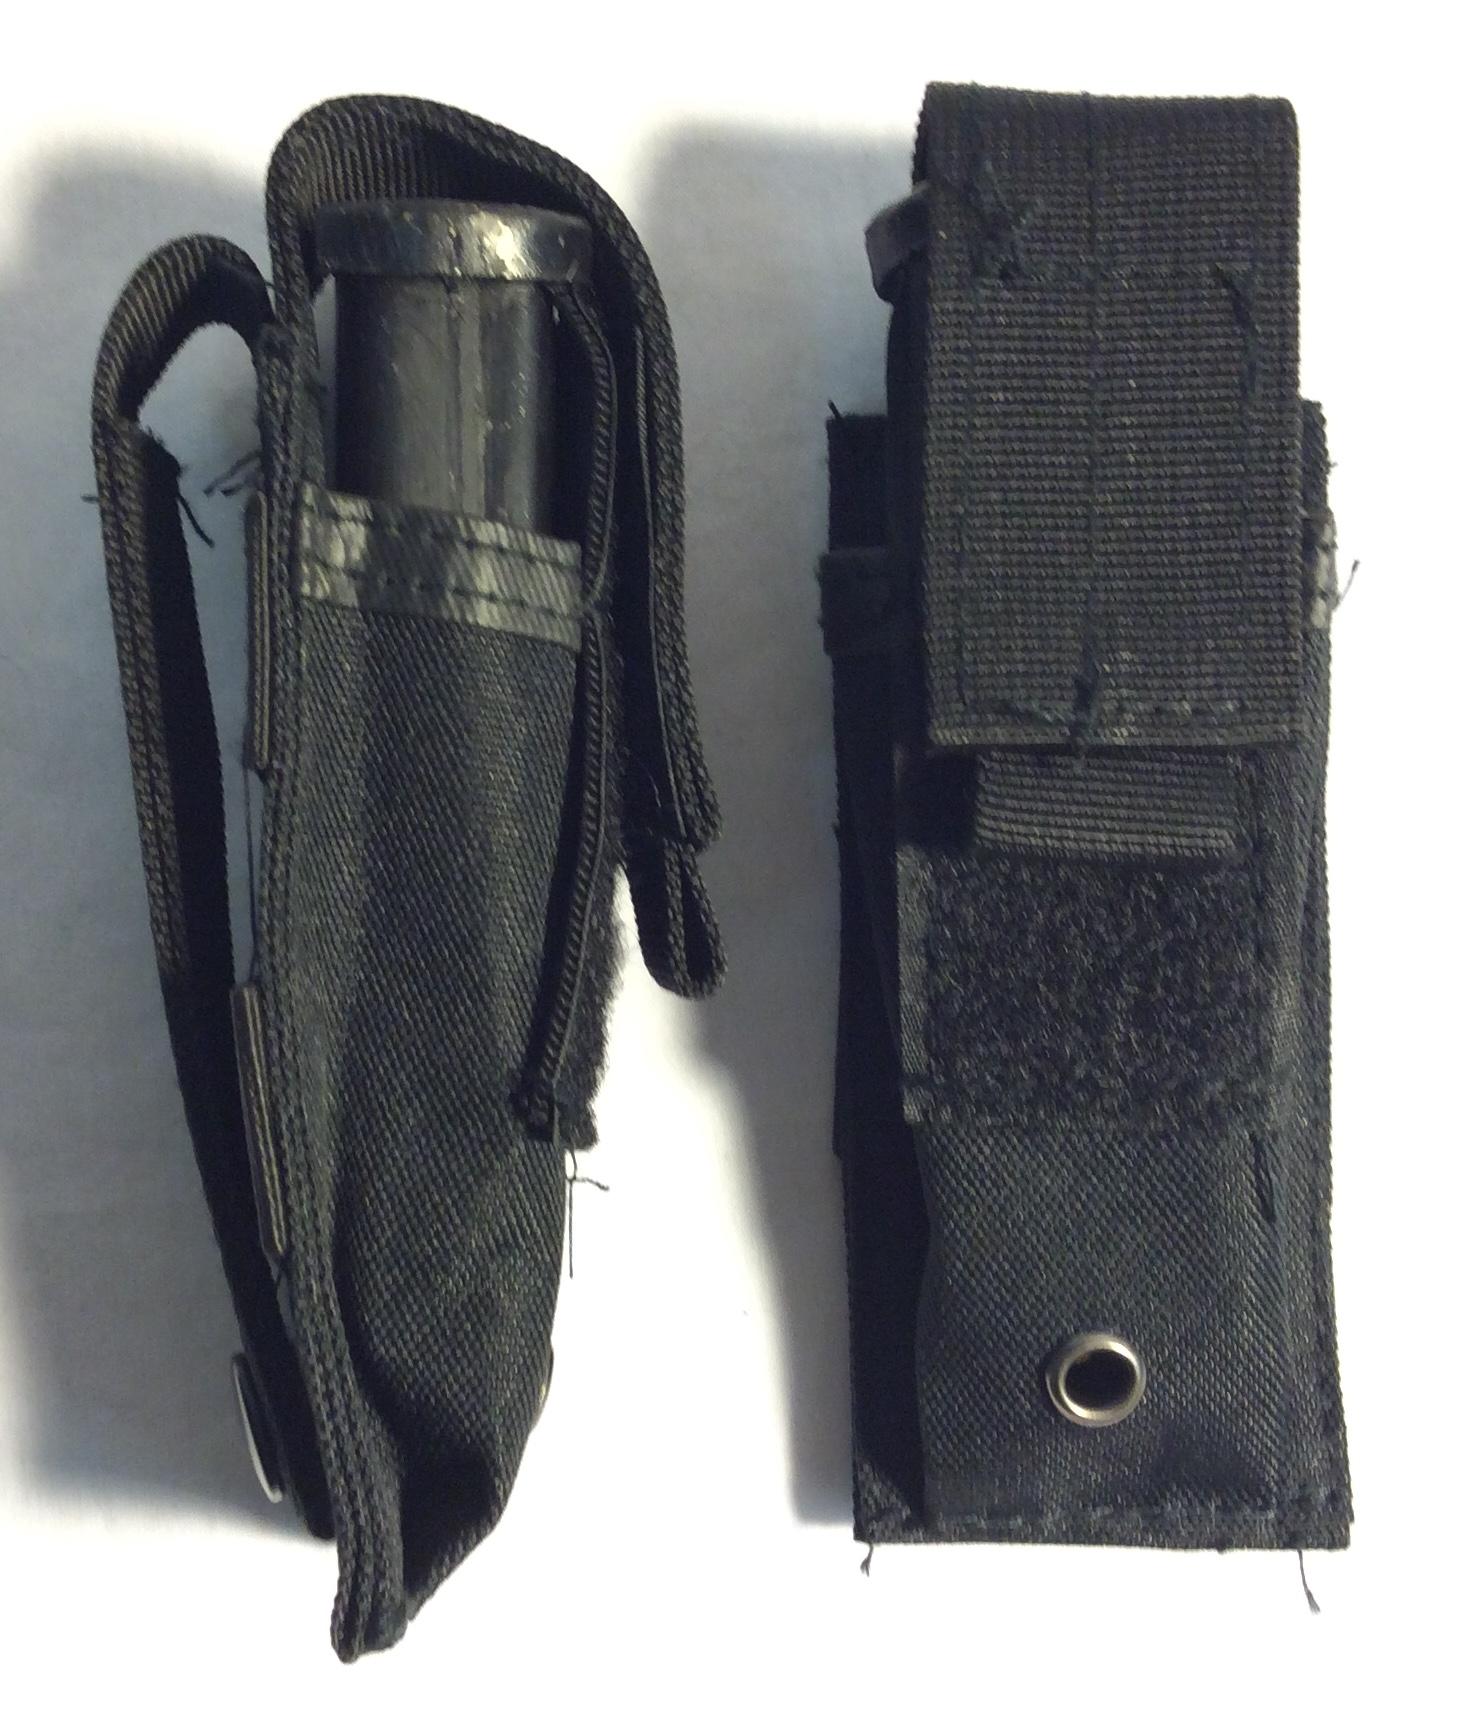 Black nylon pistol mag pouches